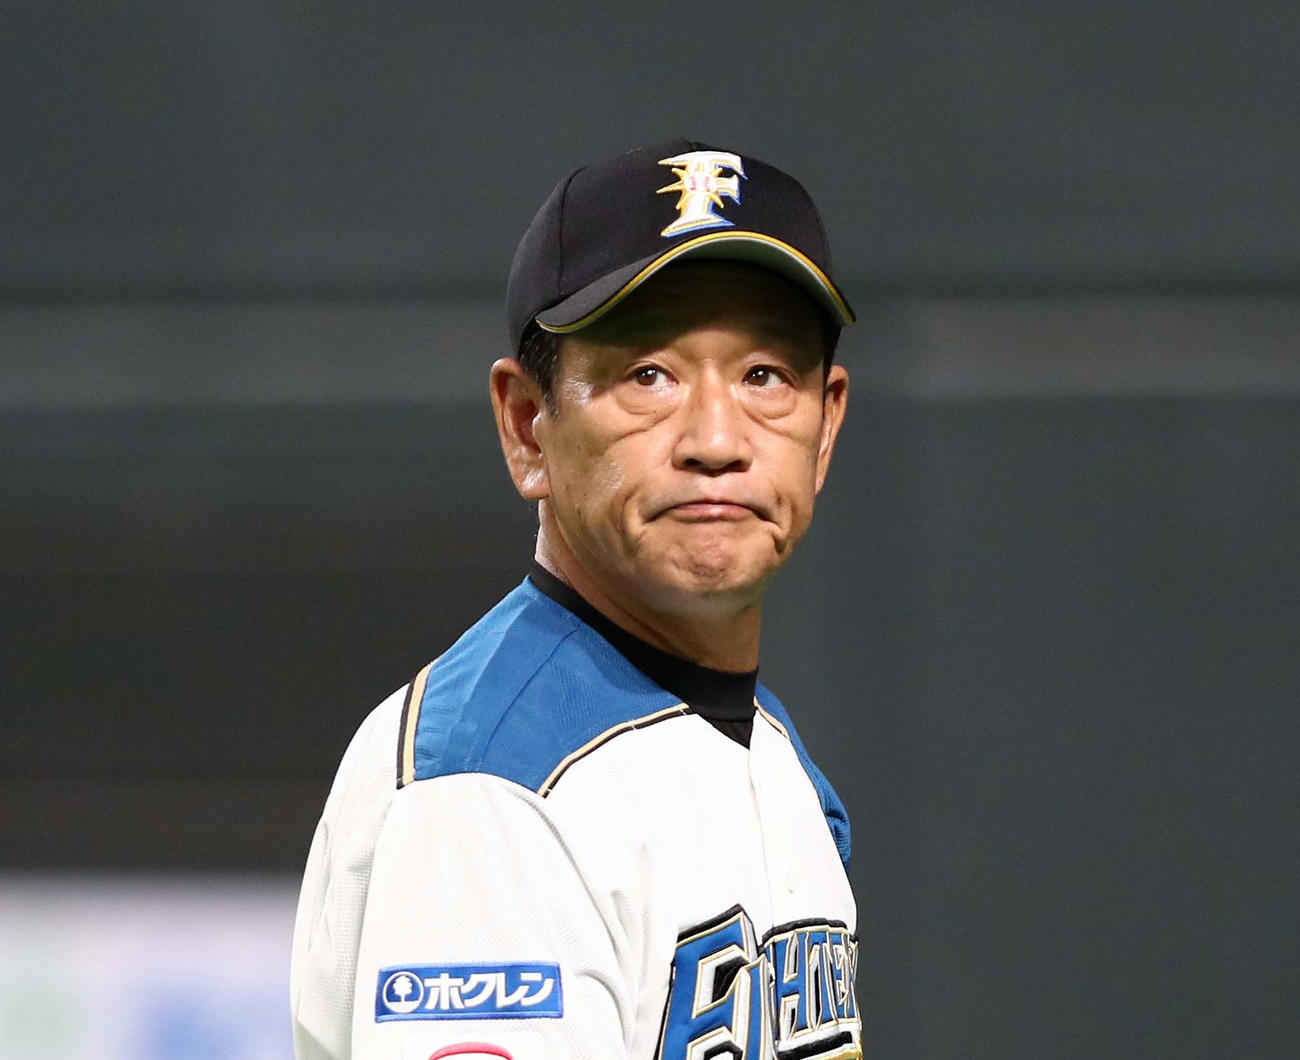 日本ハム栗山英樹監督(2020年7月1日撮影)